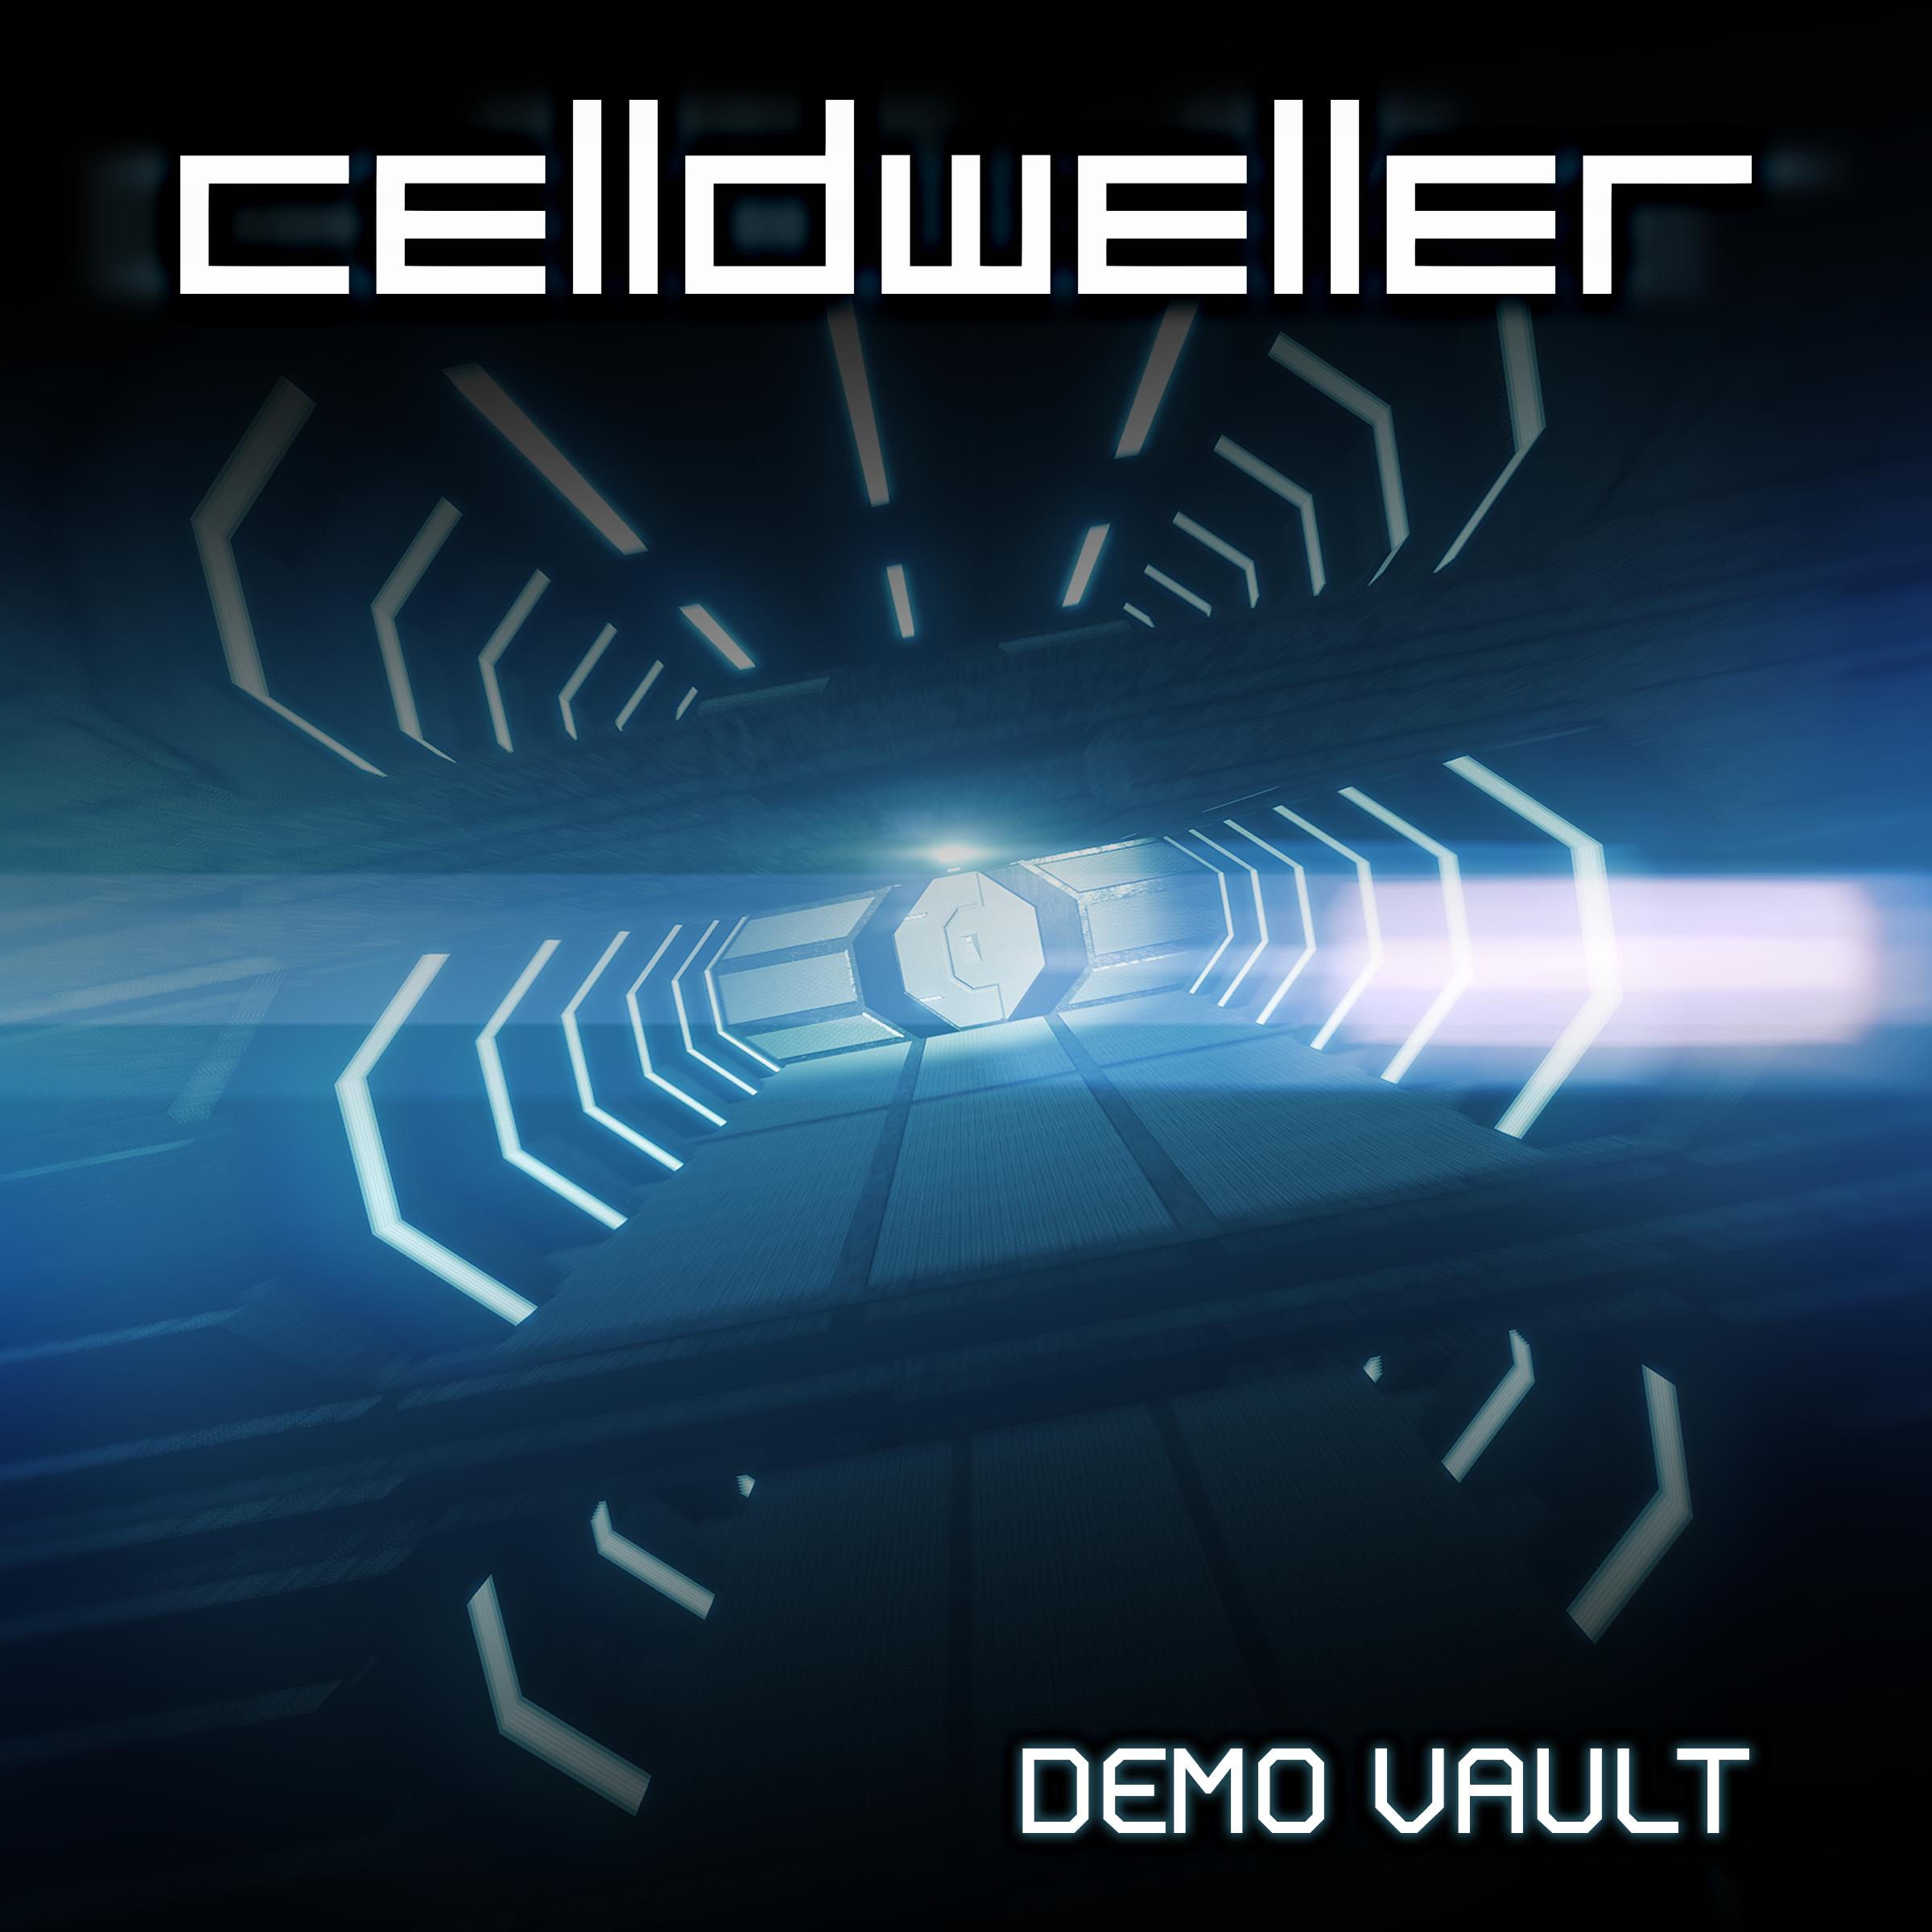 Celldweller - Demo Vault Image